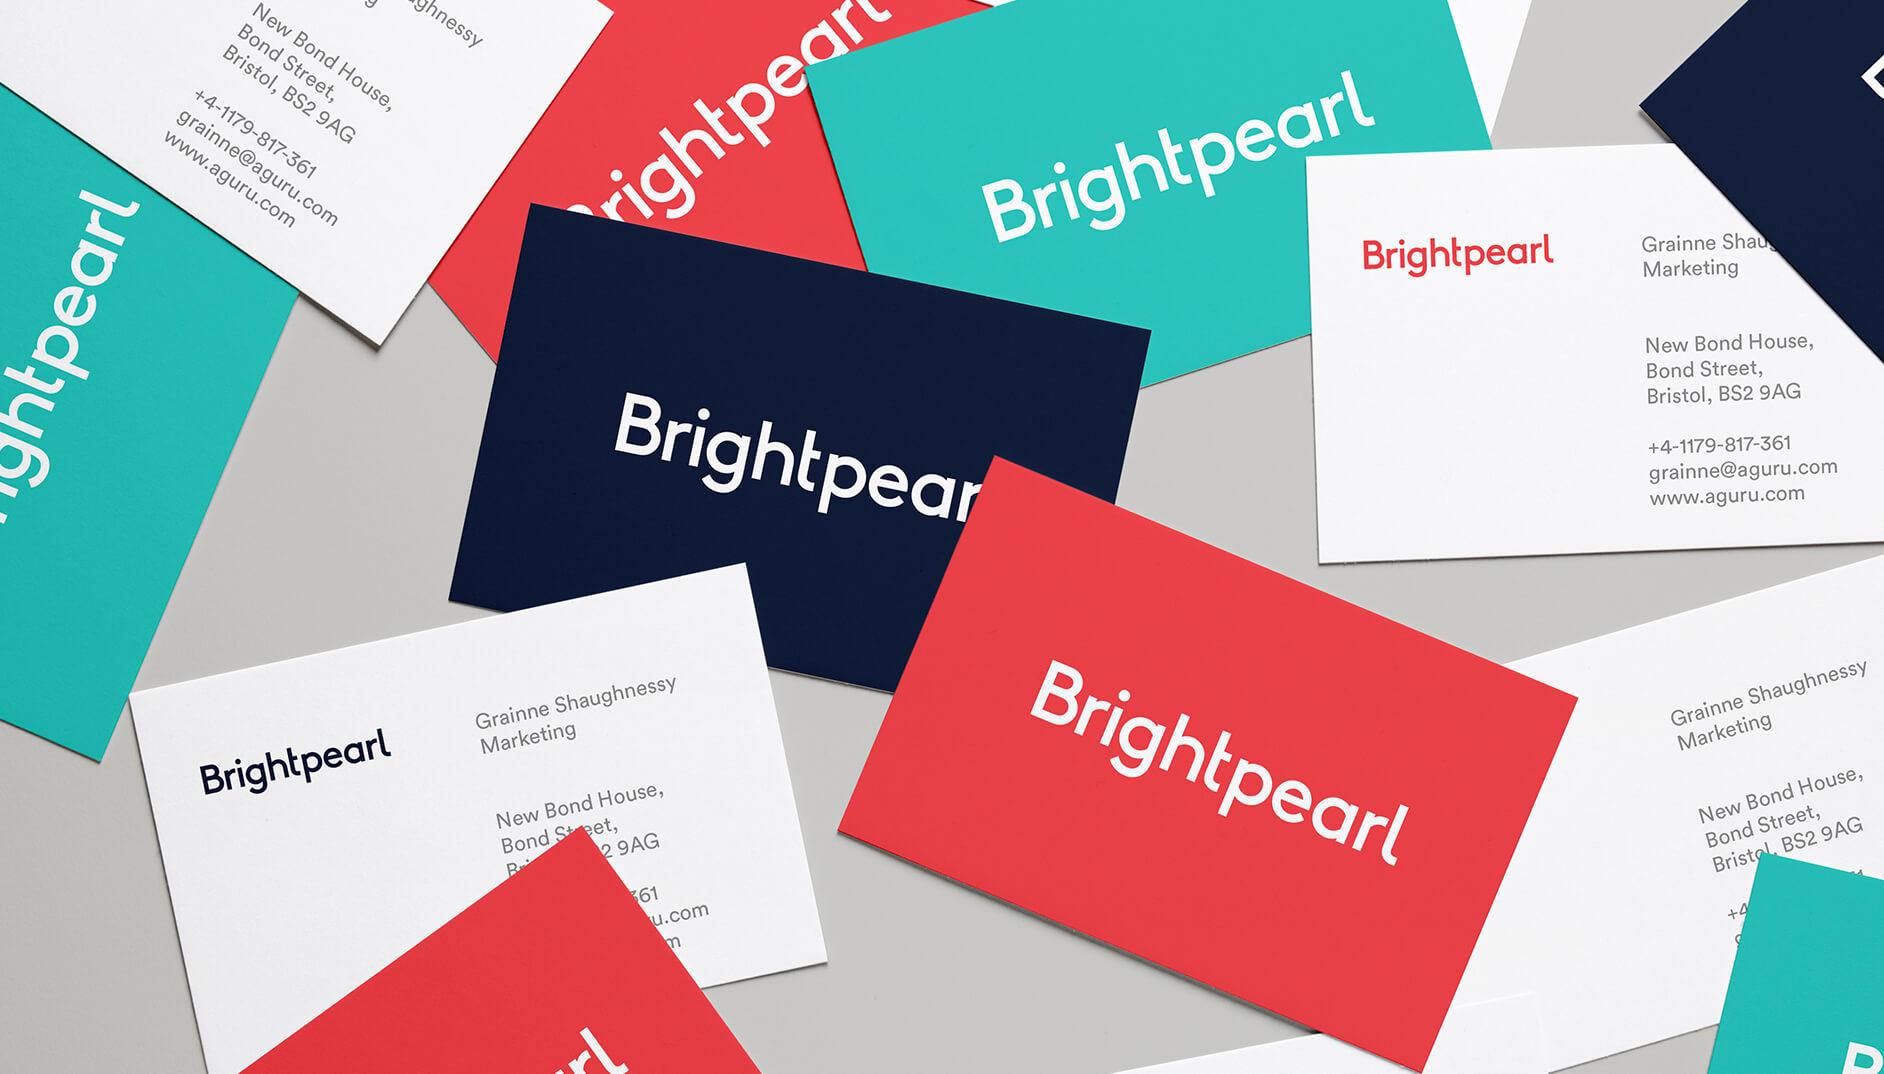 Brightpearl   Brand, Digital, Marketing, Creative